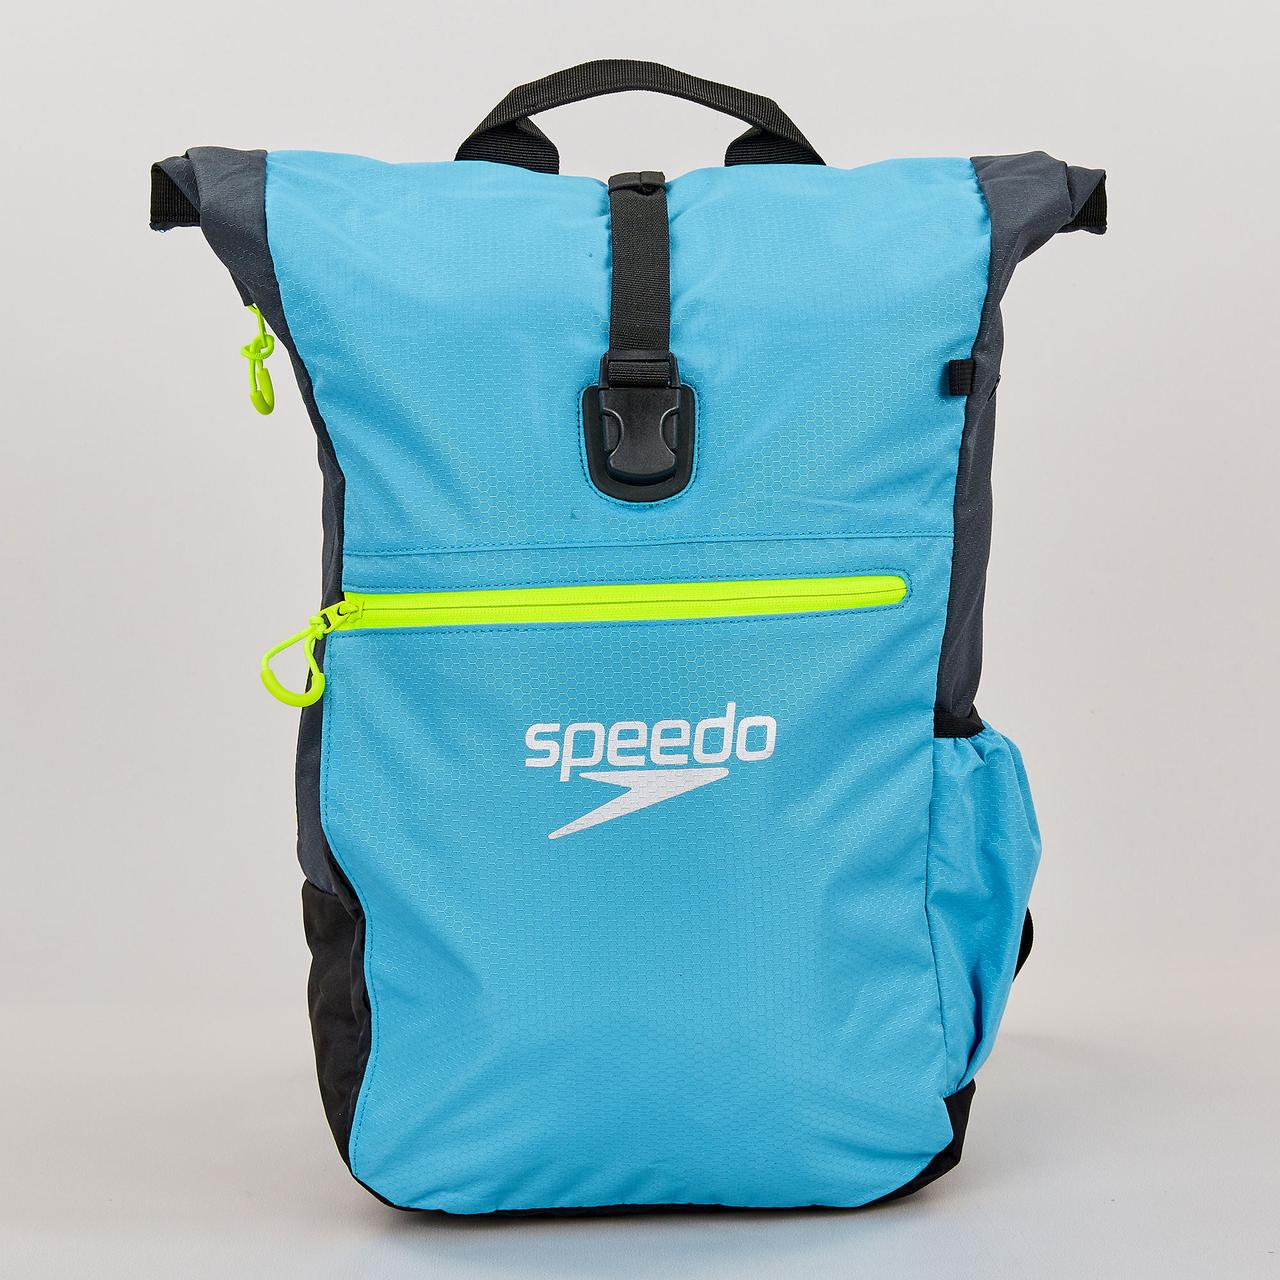 Рюкзак спортивный Speedo TEAM RUCKSACK III (полиэстер, 50х17х34см, голубой-серый) PZ-807688A670